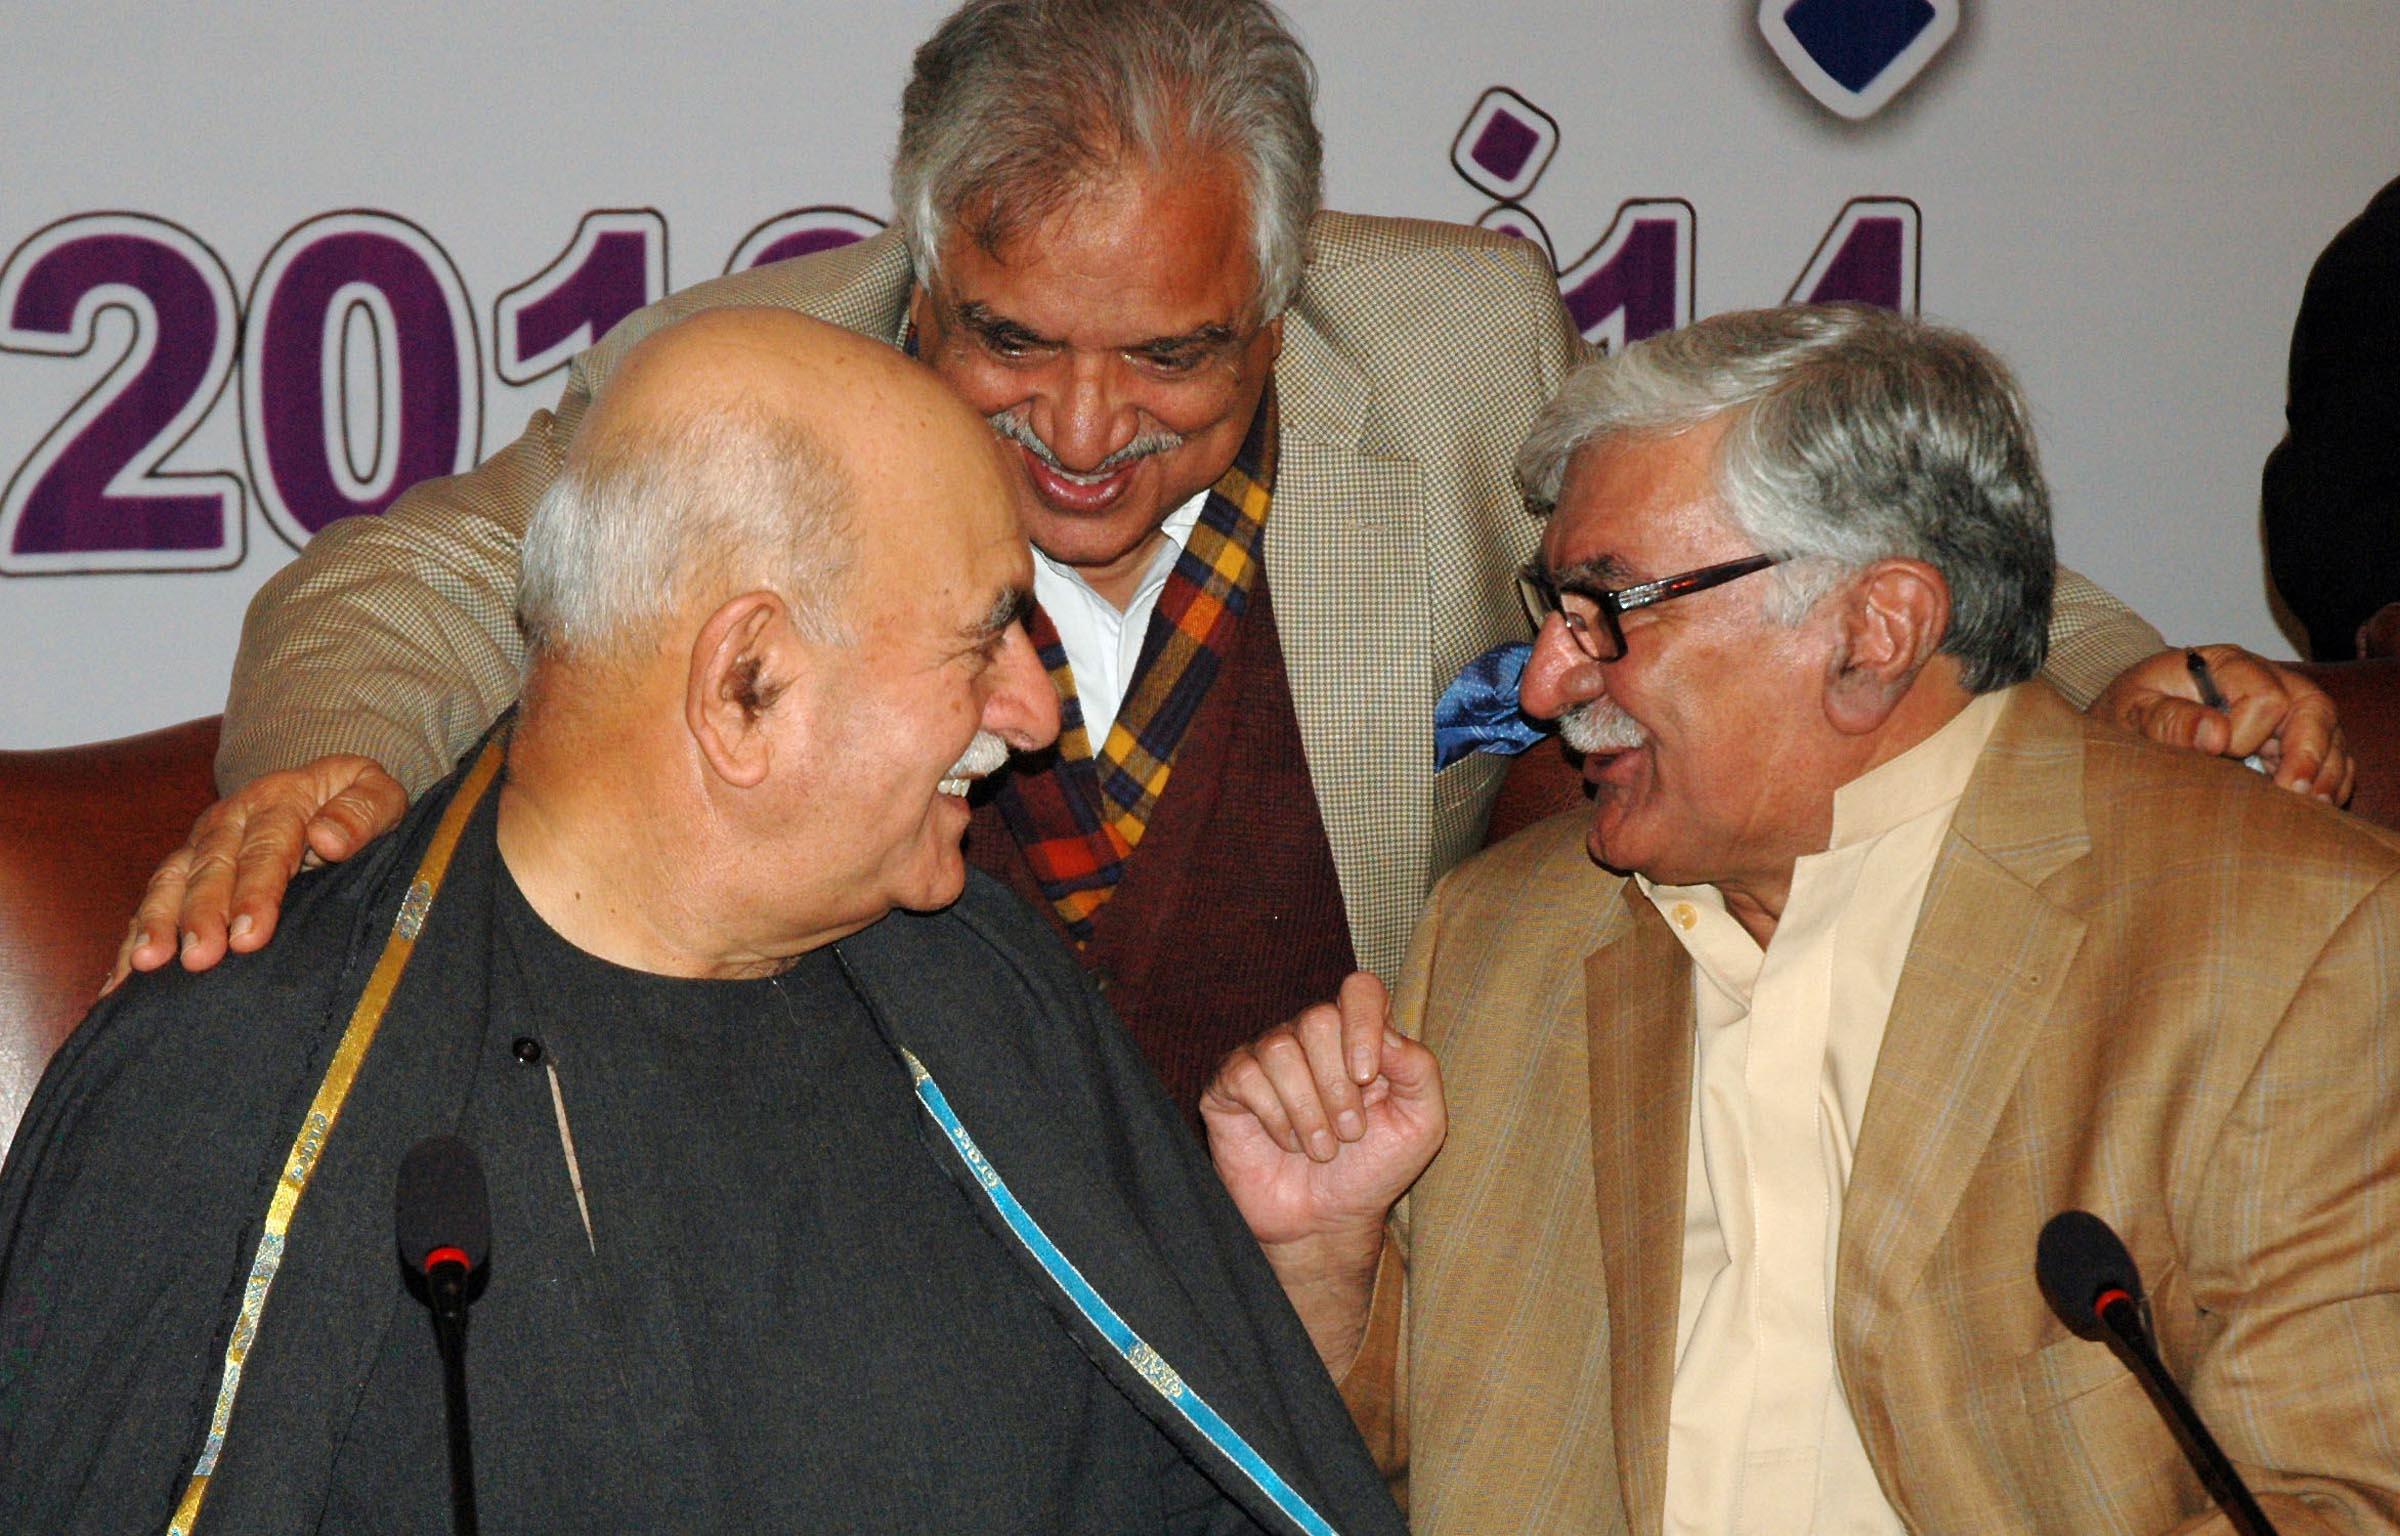 Light chat between President ANP Asfandyar Wali, Chairman Pakhtoonkhwa Milli Awami Party Mehmood Khan Achakzai and Secretary General PML-N Iqbal Zafar Jhagra at All Parties Conference in Islamabad on Thursday. PHOTO: EXPRESS TRIBUNE